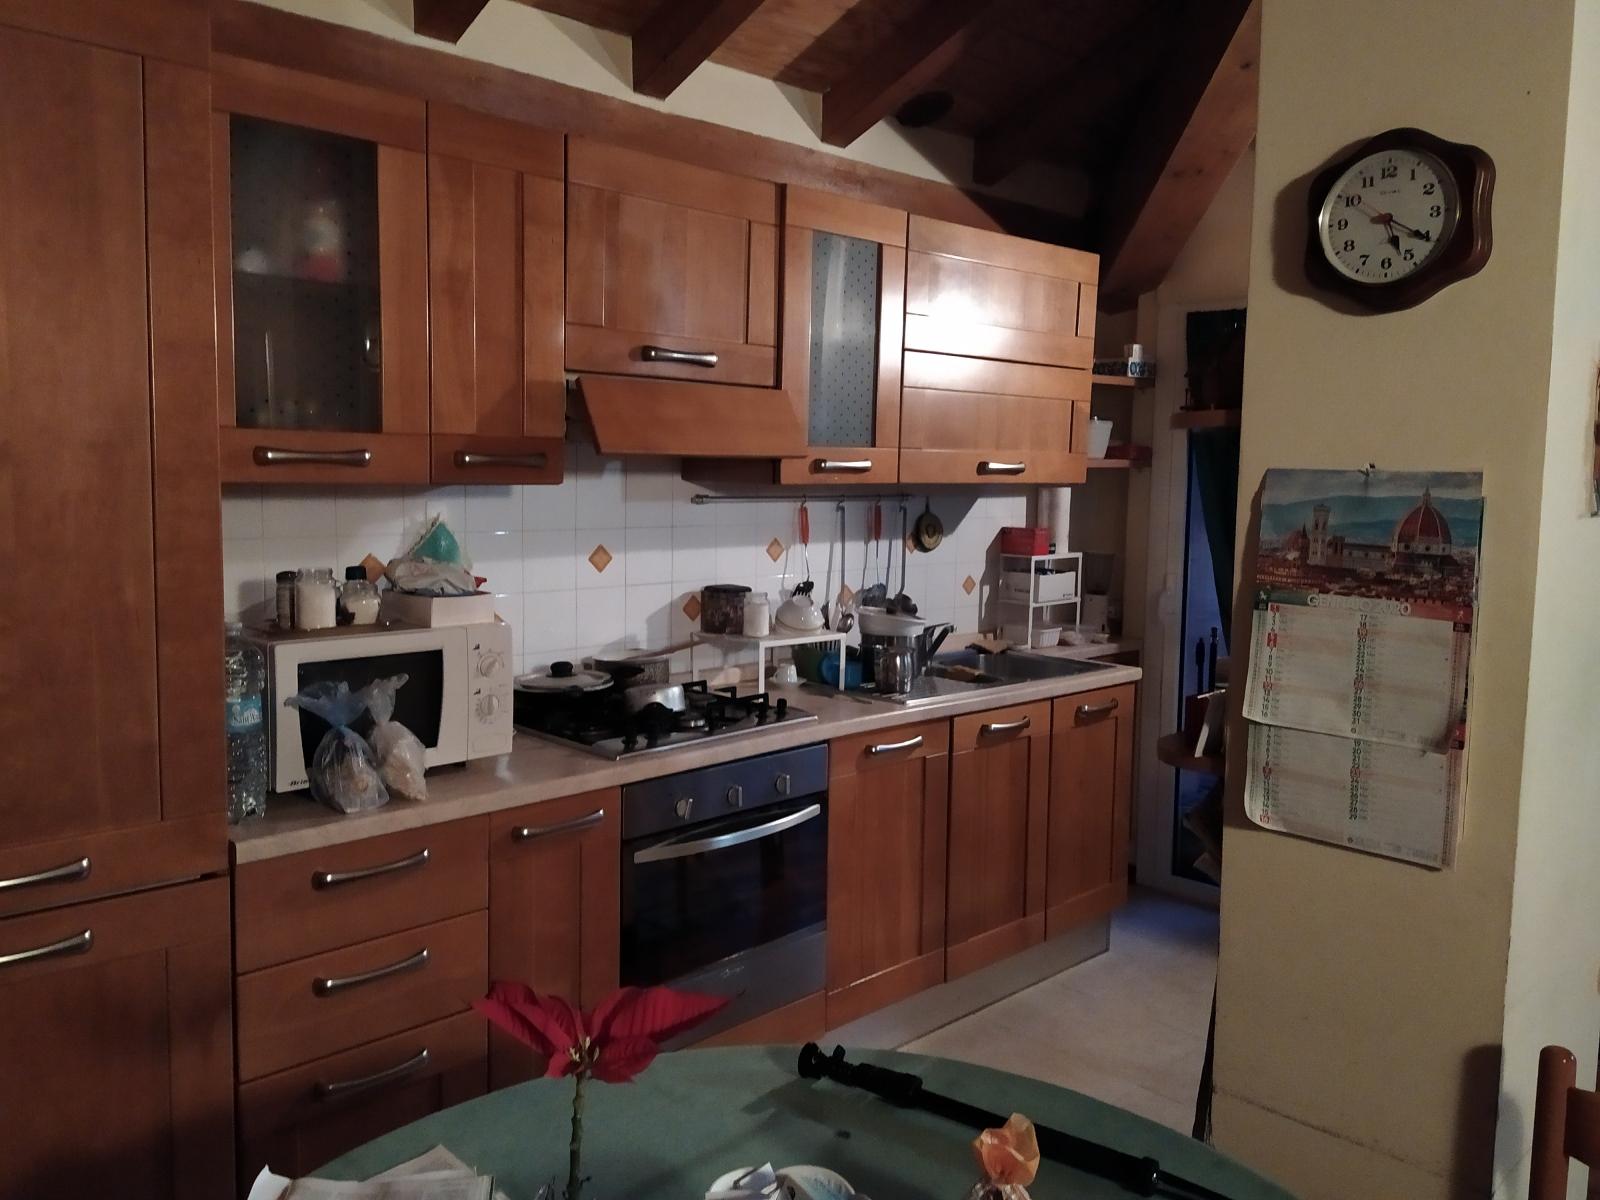 mansarda-muggiano-milano-via-lucera-vendita-spaziourbano-immobiliare-13